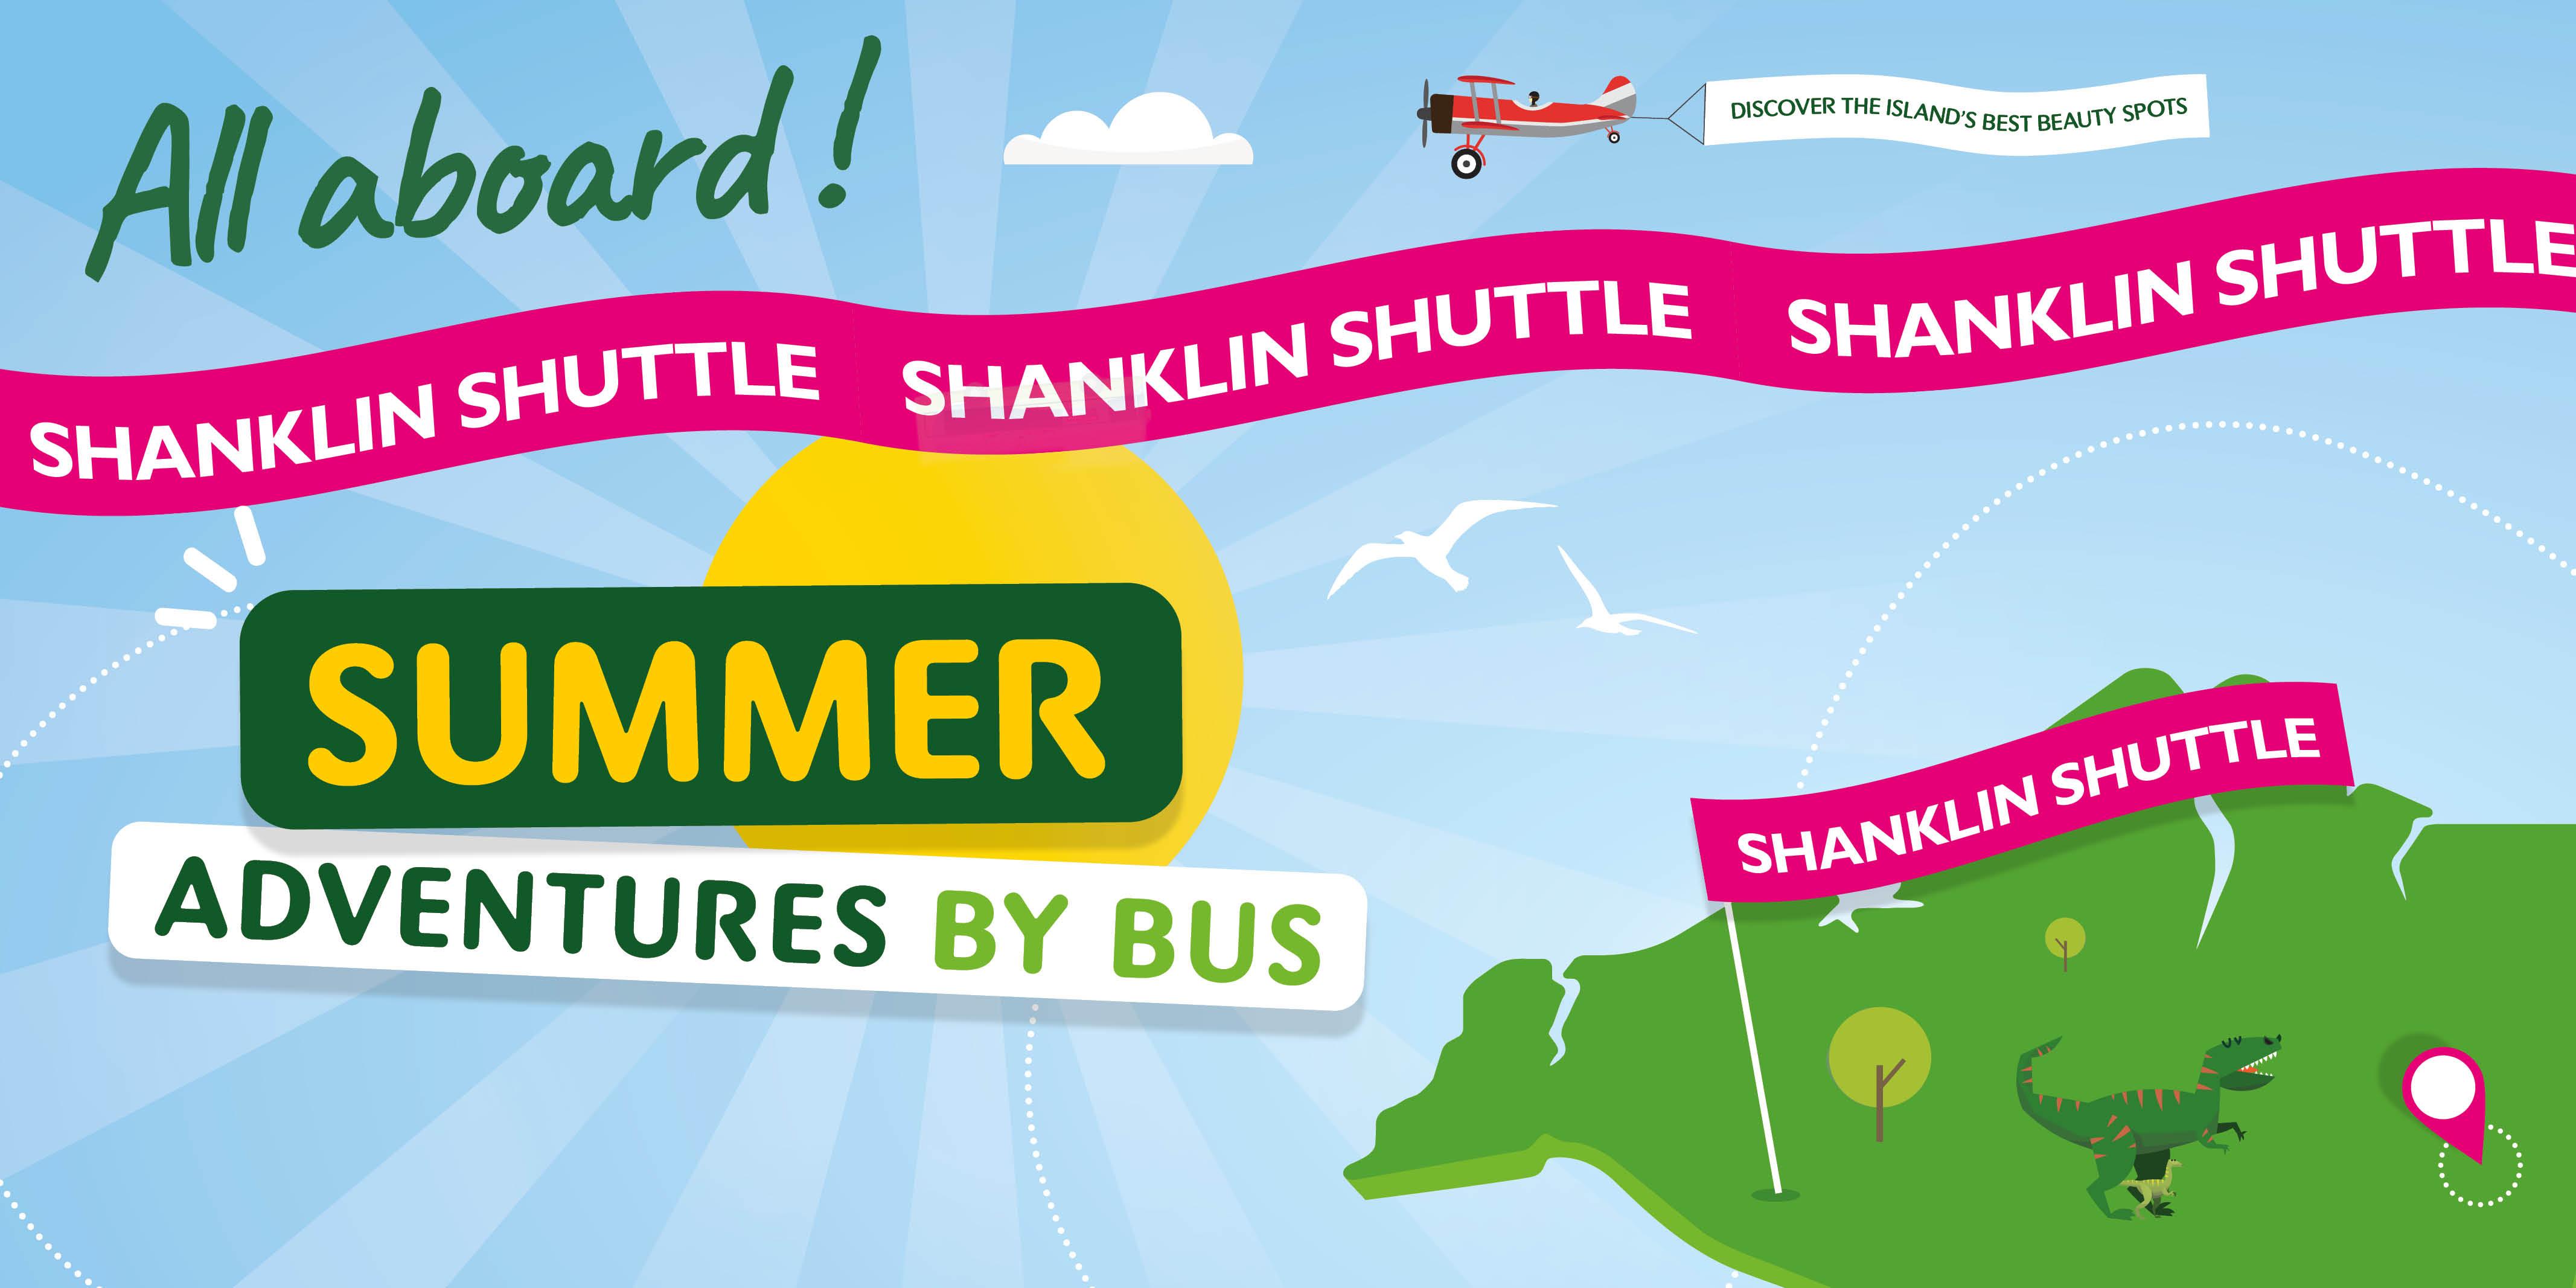 Shanklin Shuttle